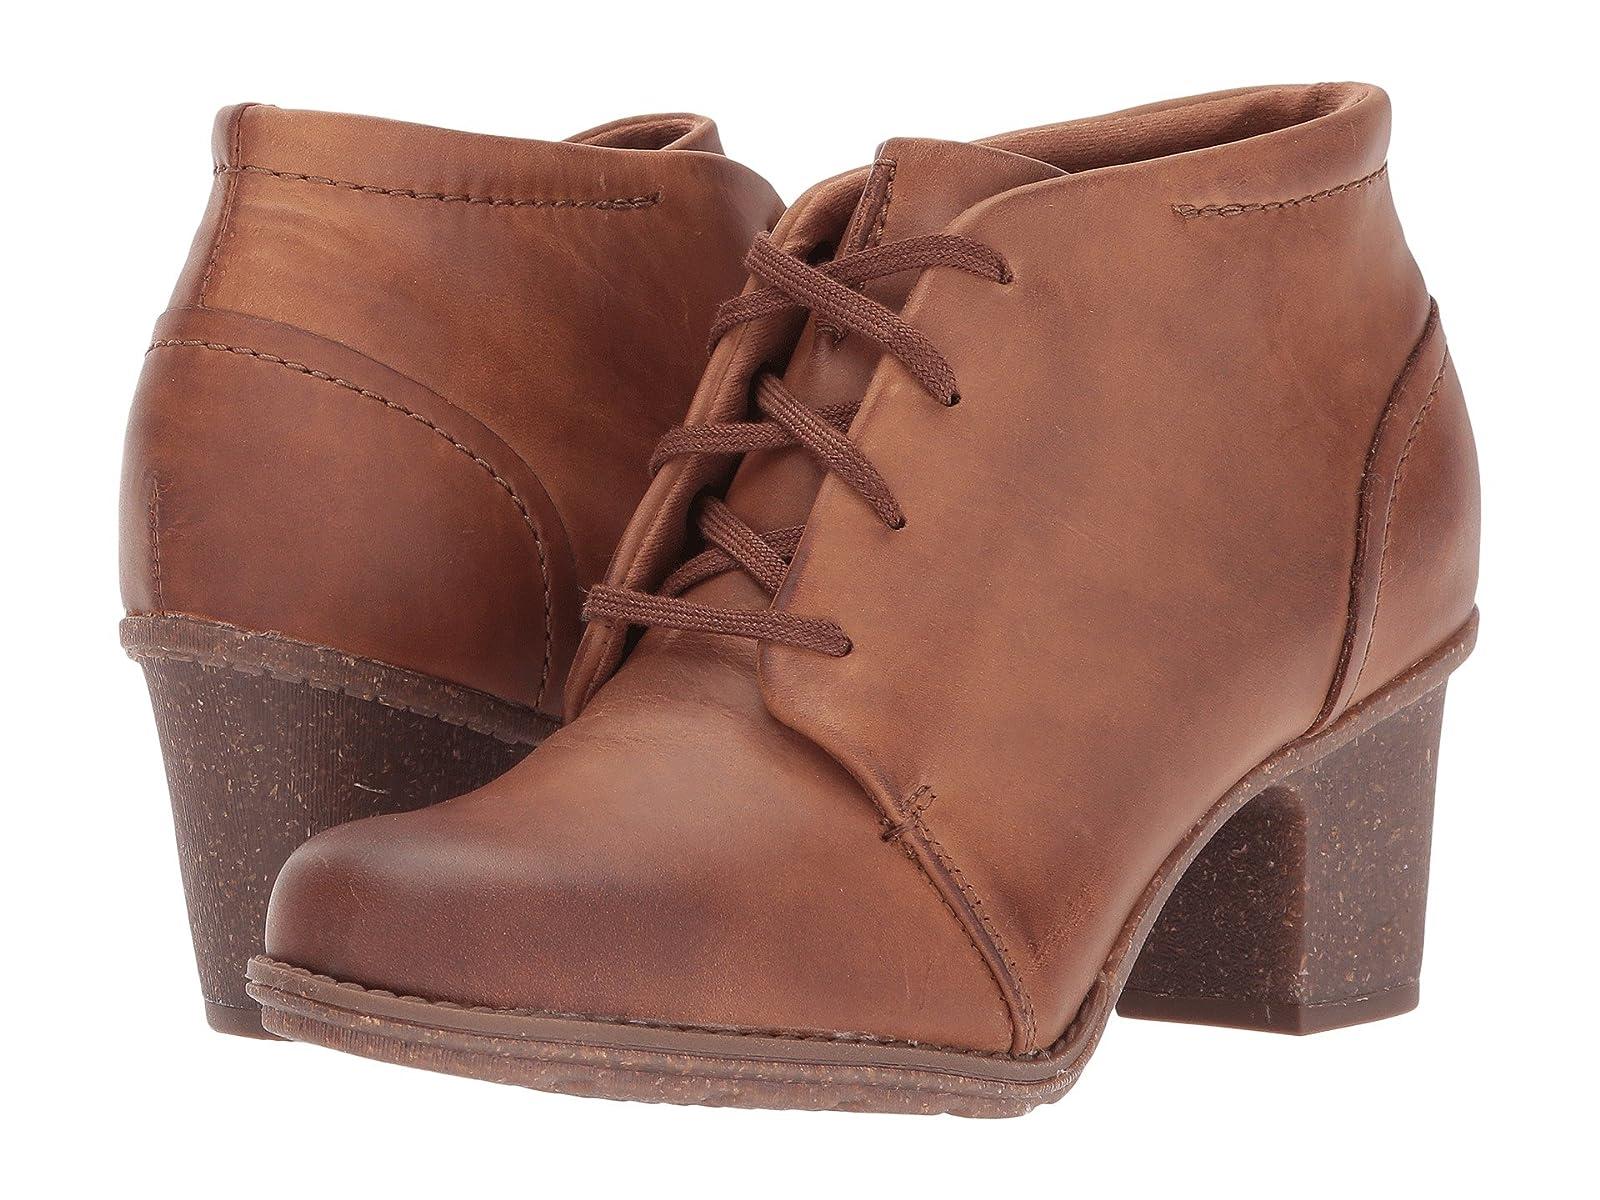 Clarks Sashlin SueCheap and distinctive eye-catching shoes